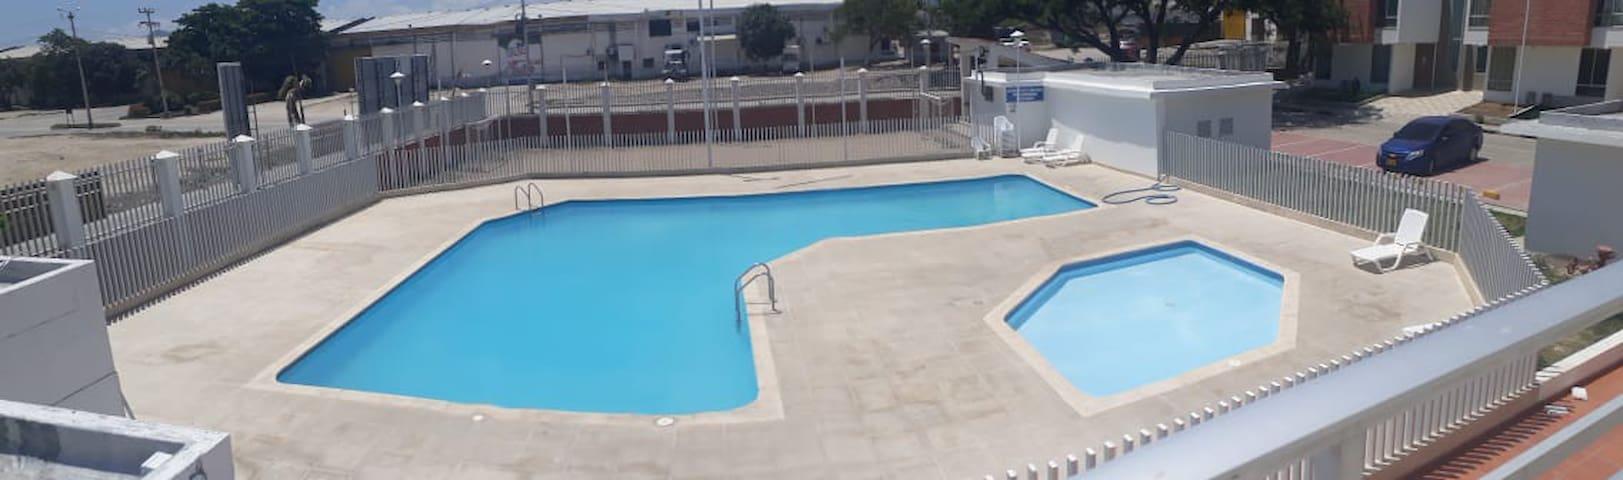 Apto con balcón, piscina y  todas las comunidades